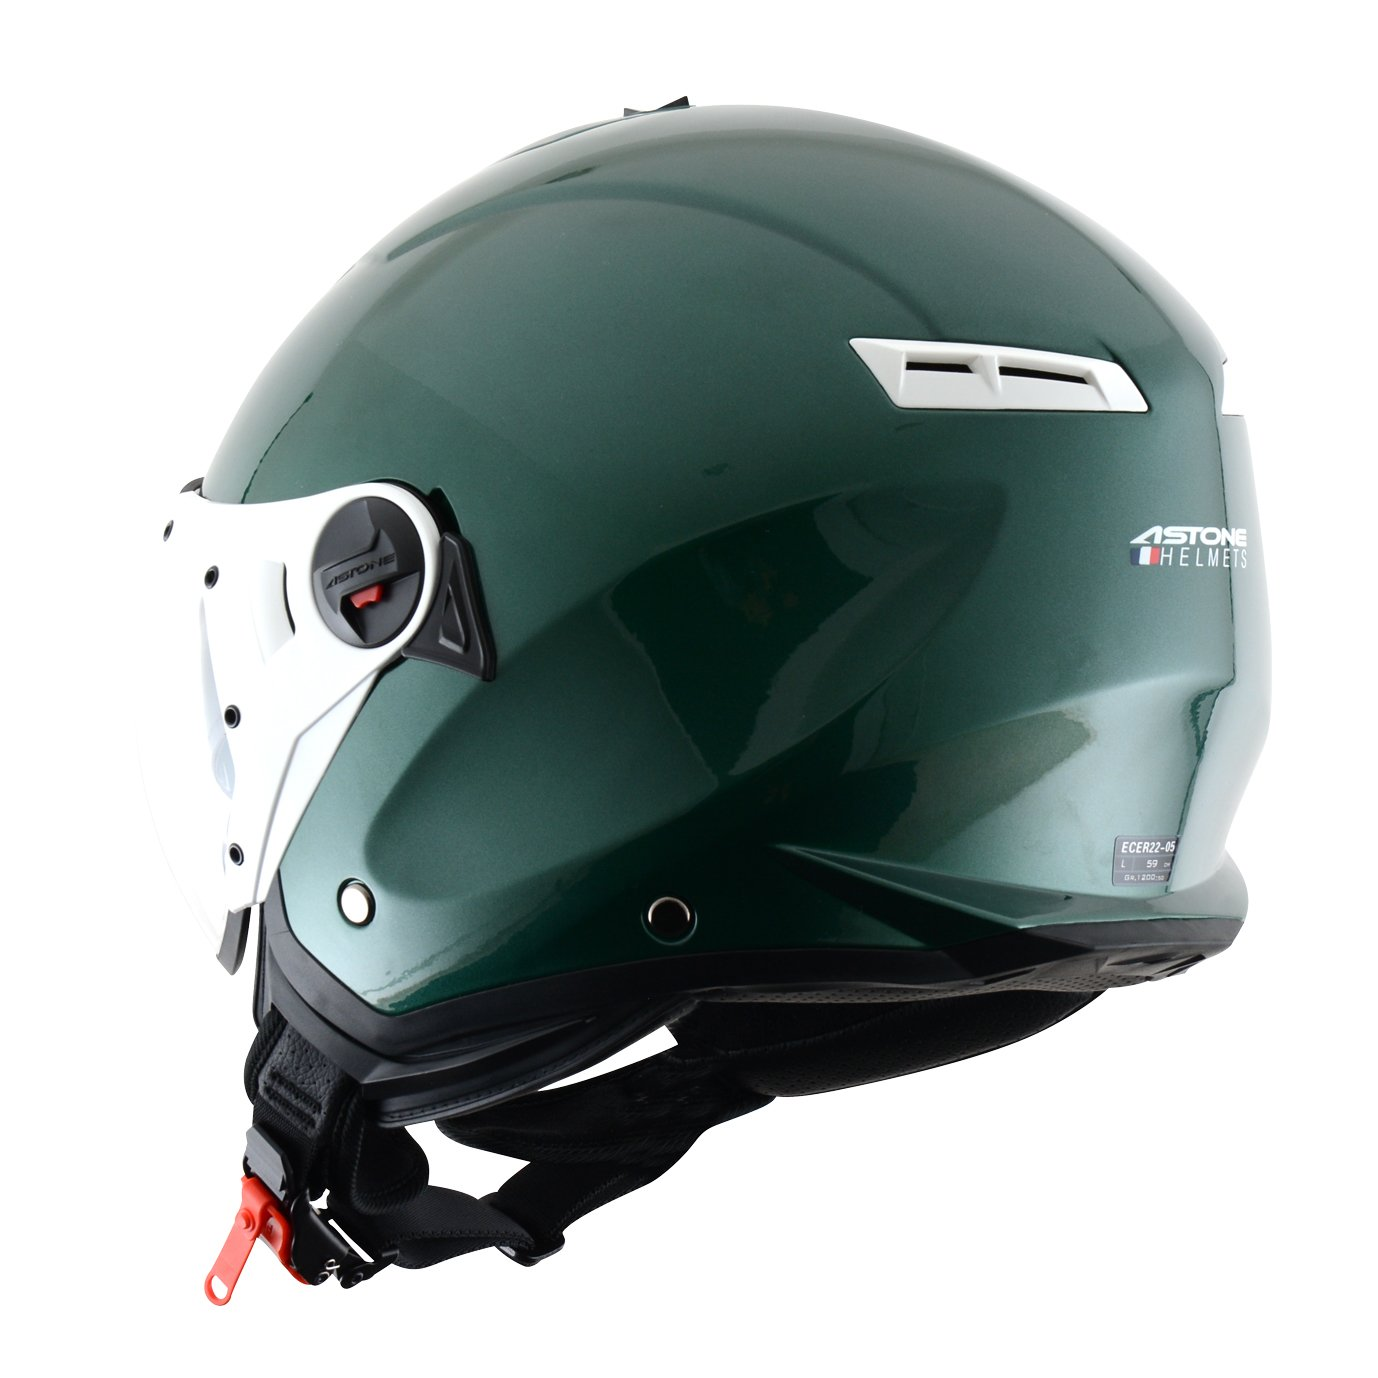 Amazon.es: Astone Helmets MINISPORT-MTIM Minijet Sport - Casco de motocicleta, Gris Mate, M